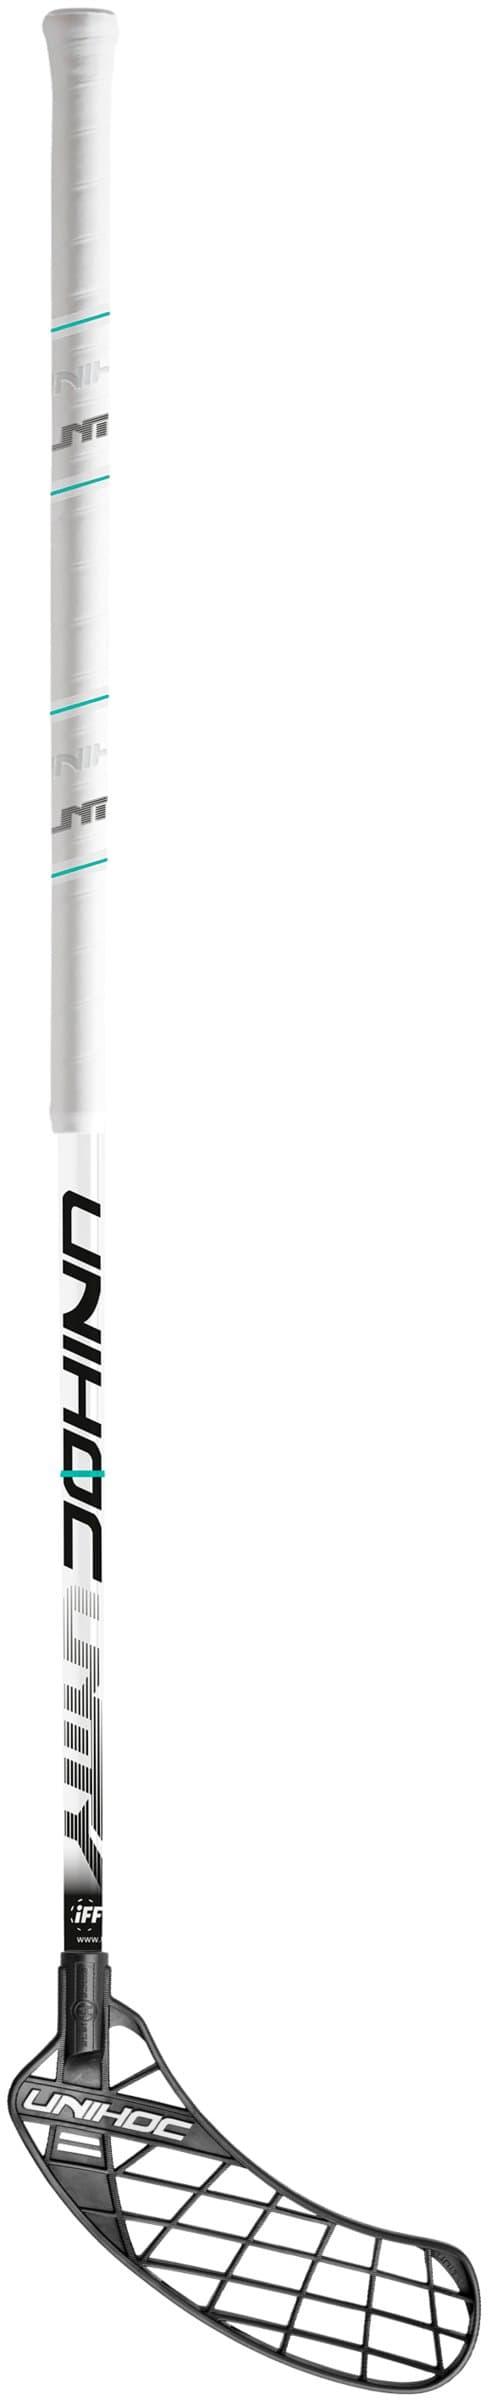 Unihoc Unity 26 inkl. Unity Blade Bastone senior 104 cm